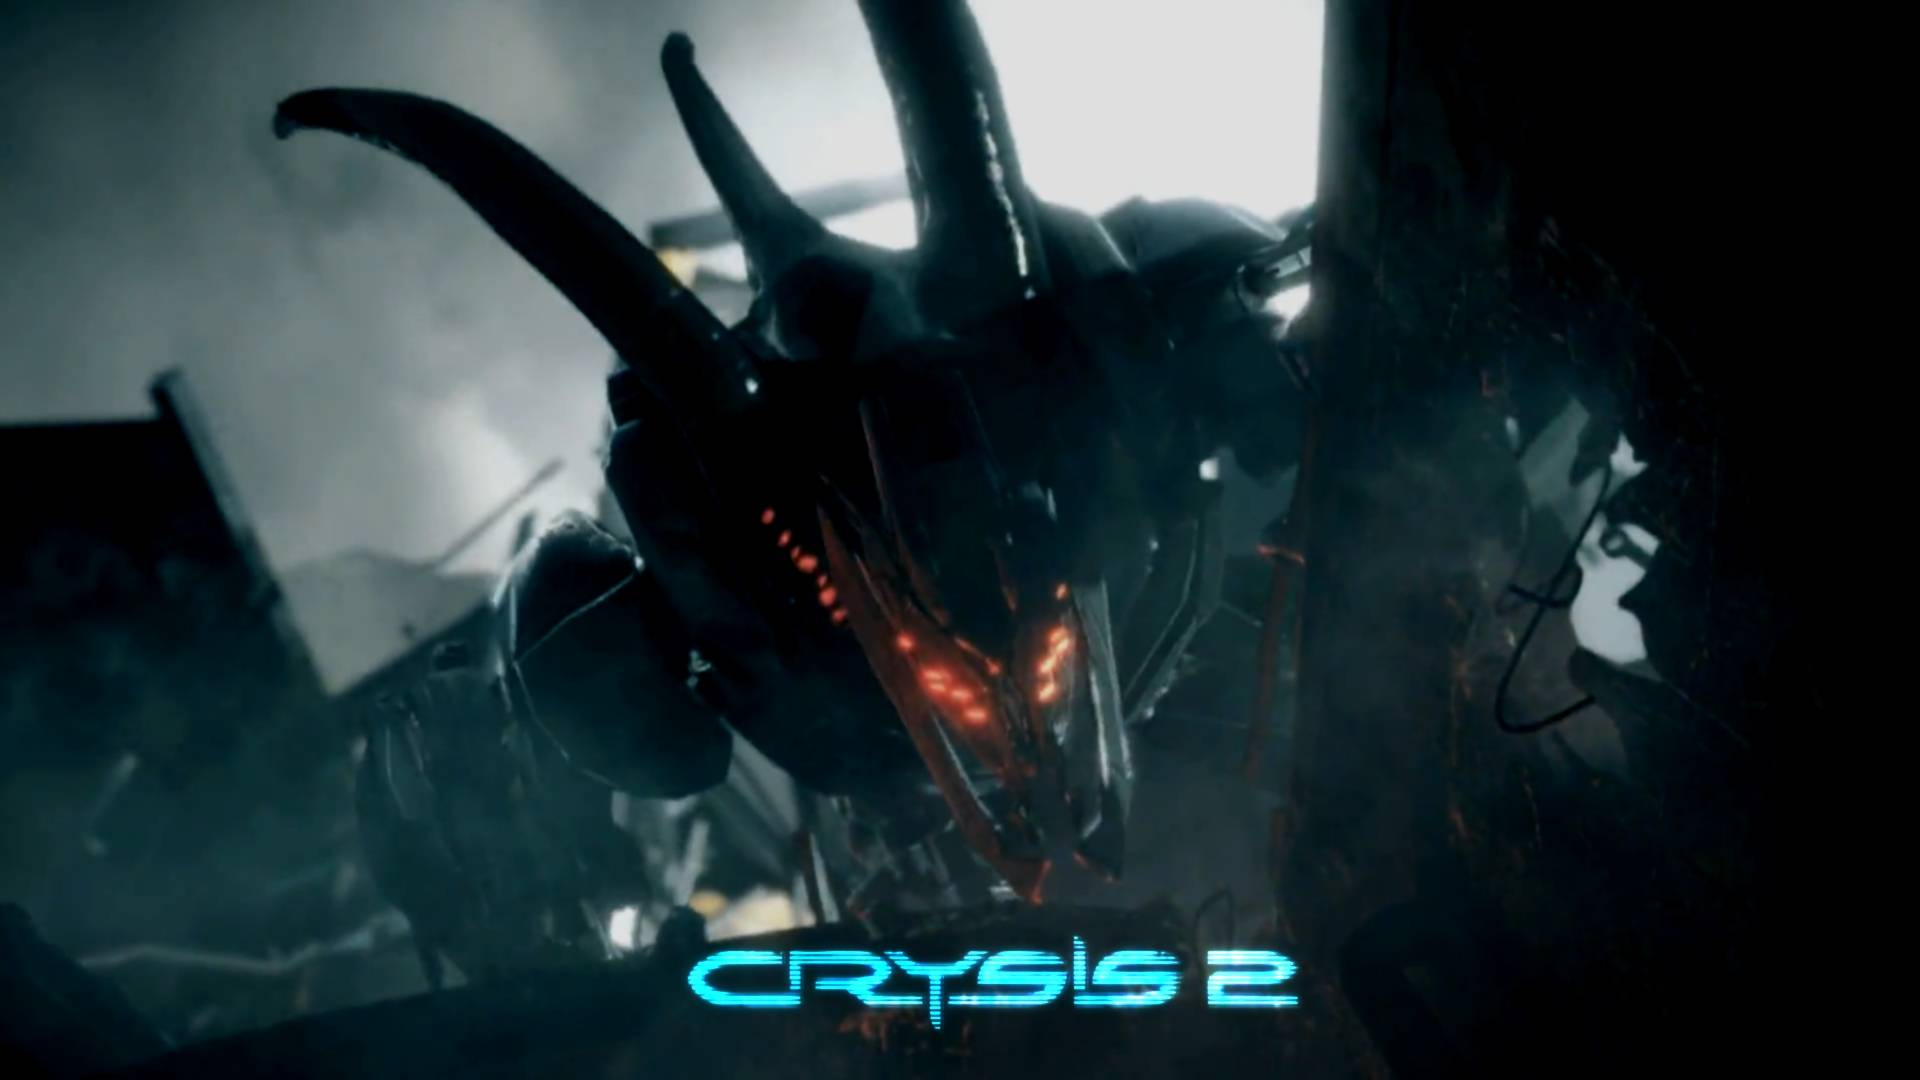 Crysis 2 Wallpaper Full HD 1080P 1920x1080